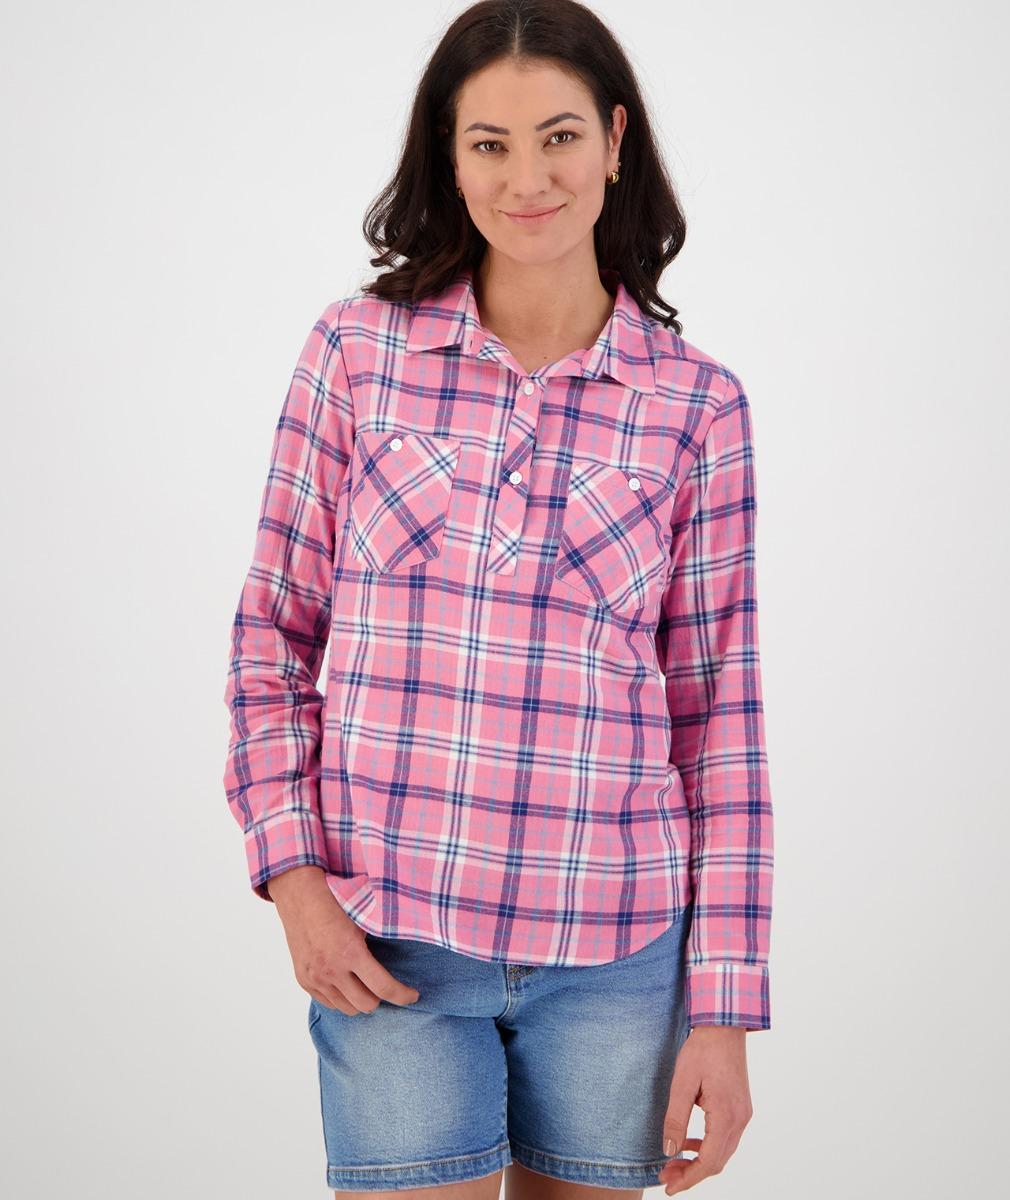 Swanndri Women's Flora Long Sleeve Shirt in Pink/Navy